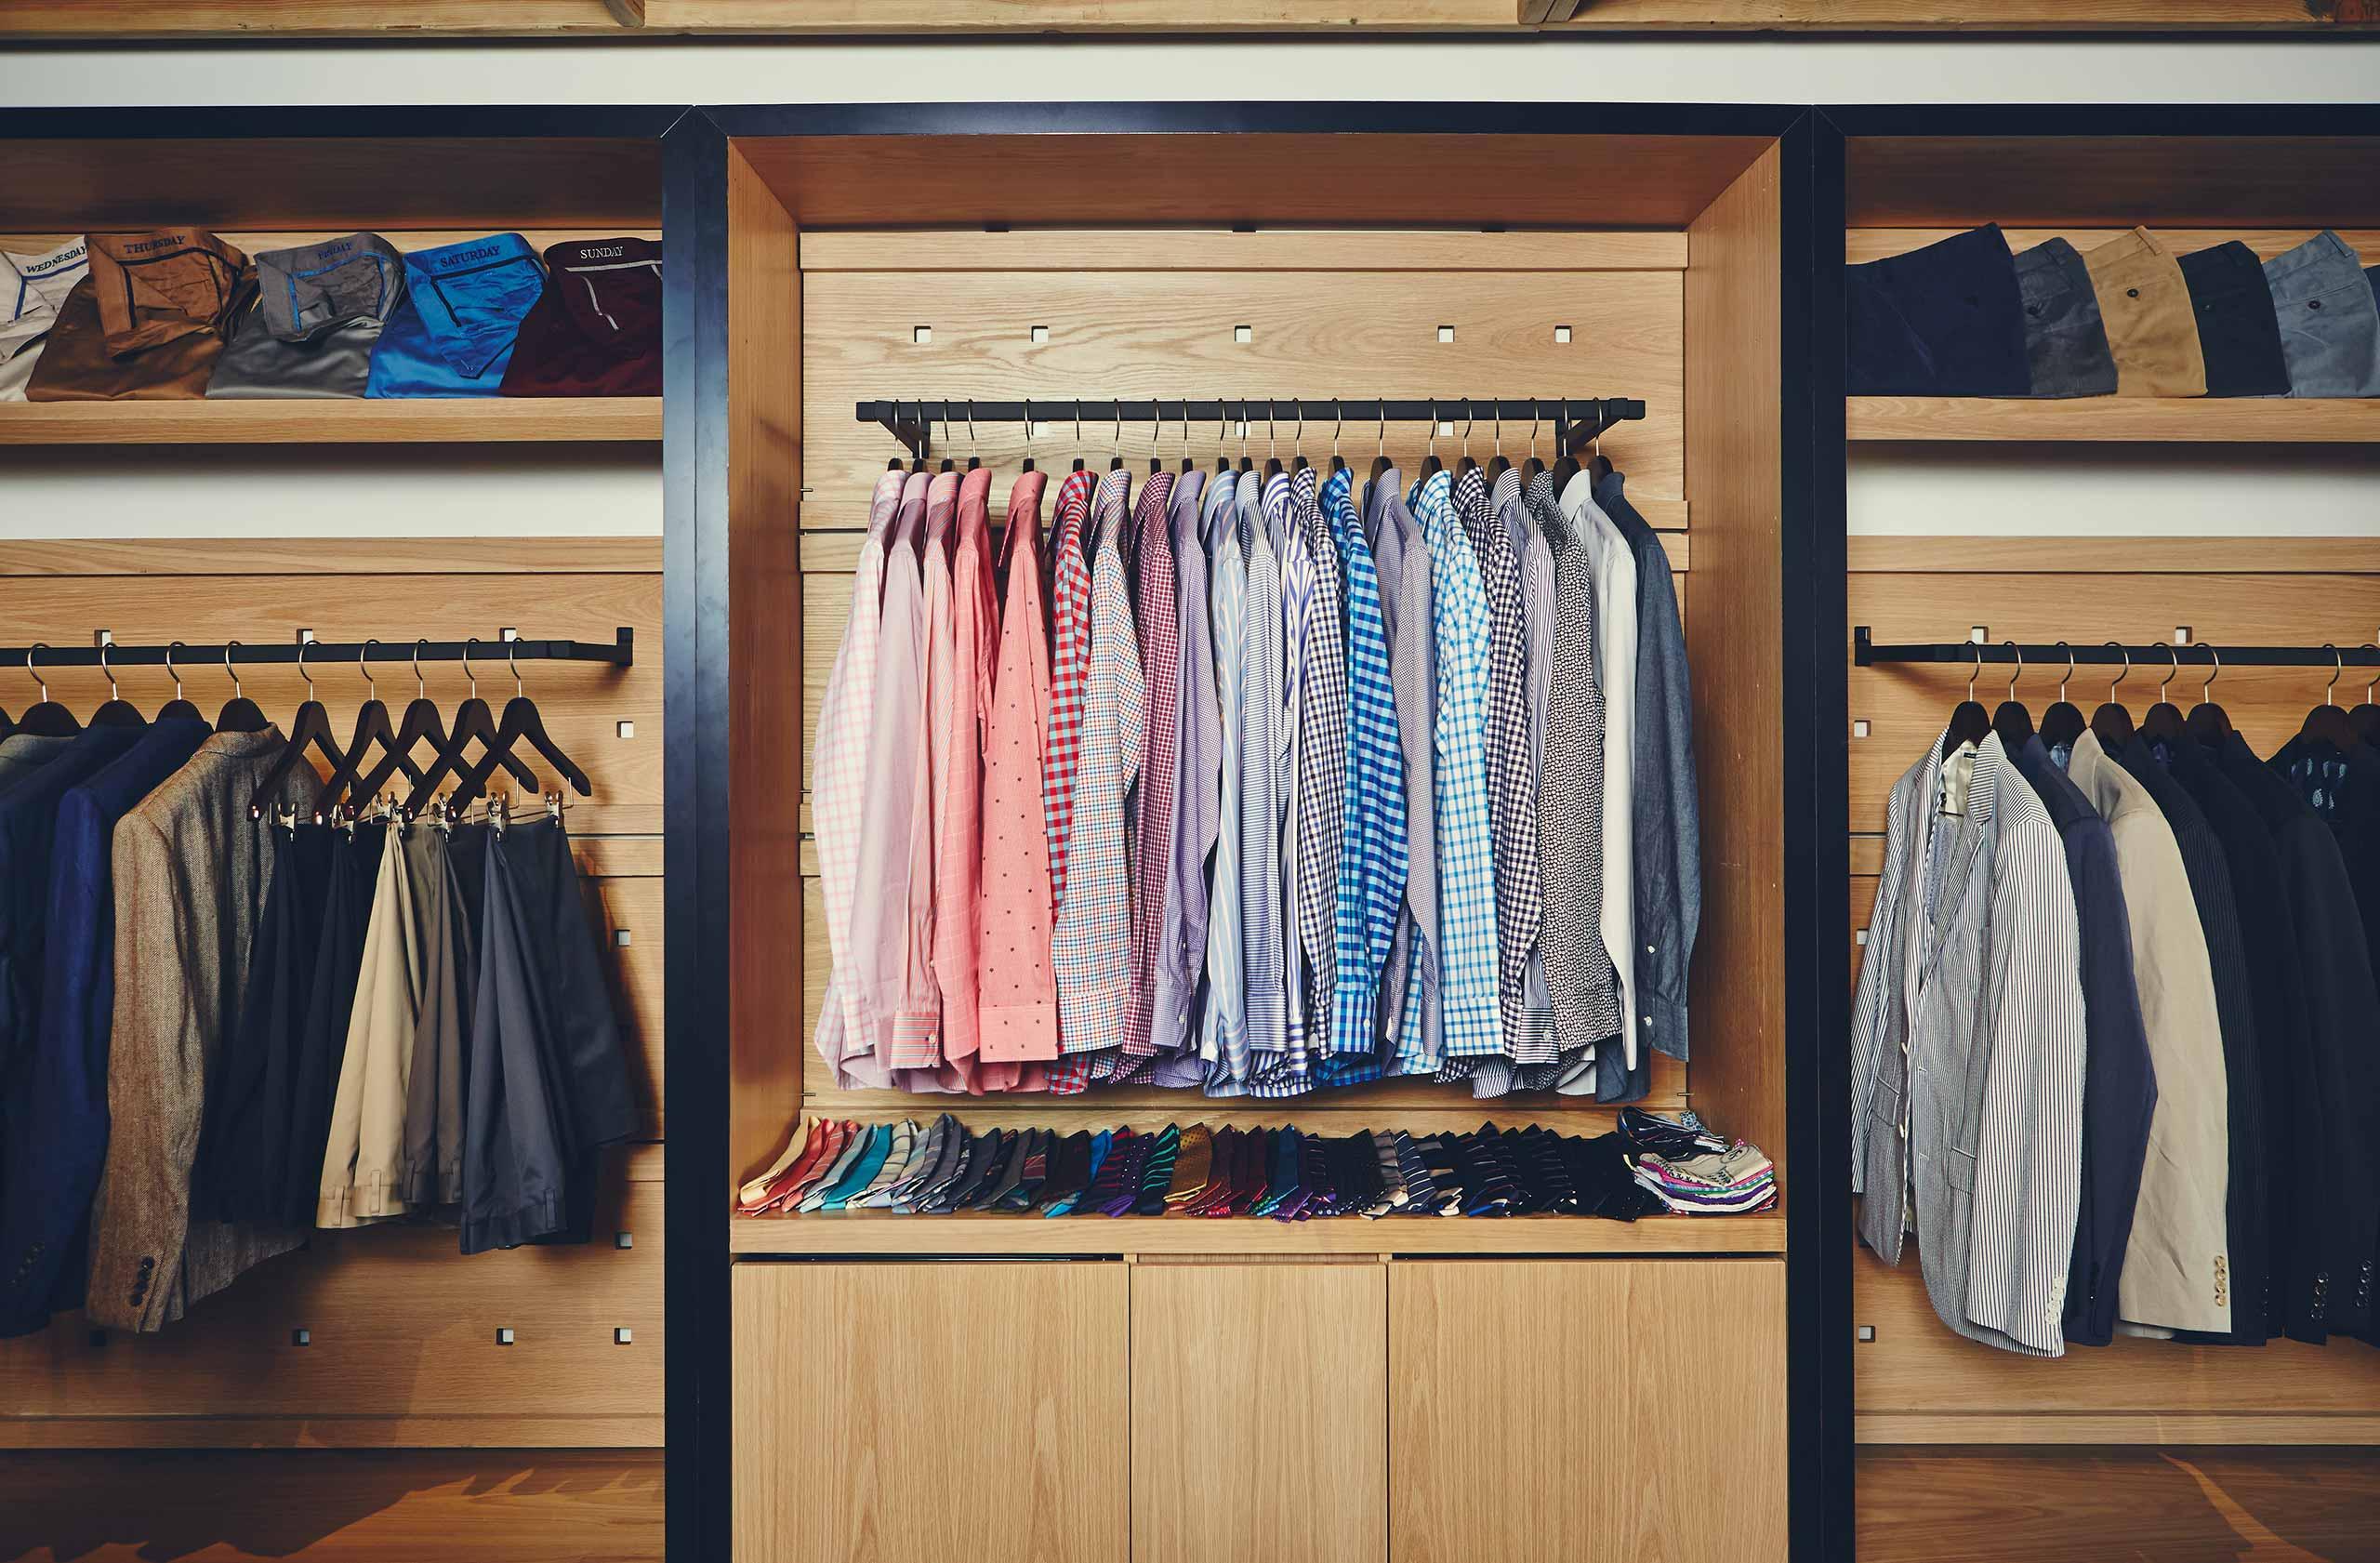 Bonobos shirts in a closet